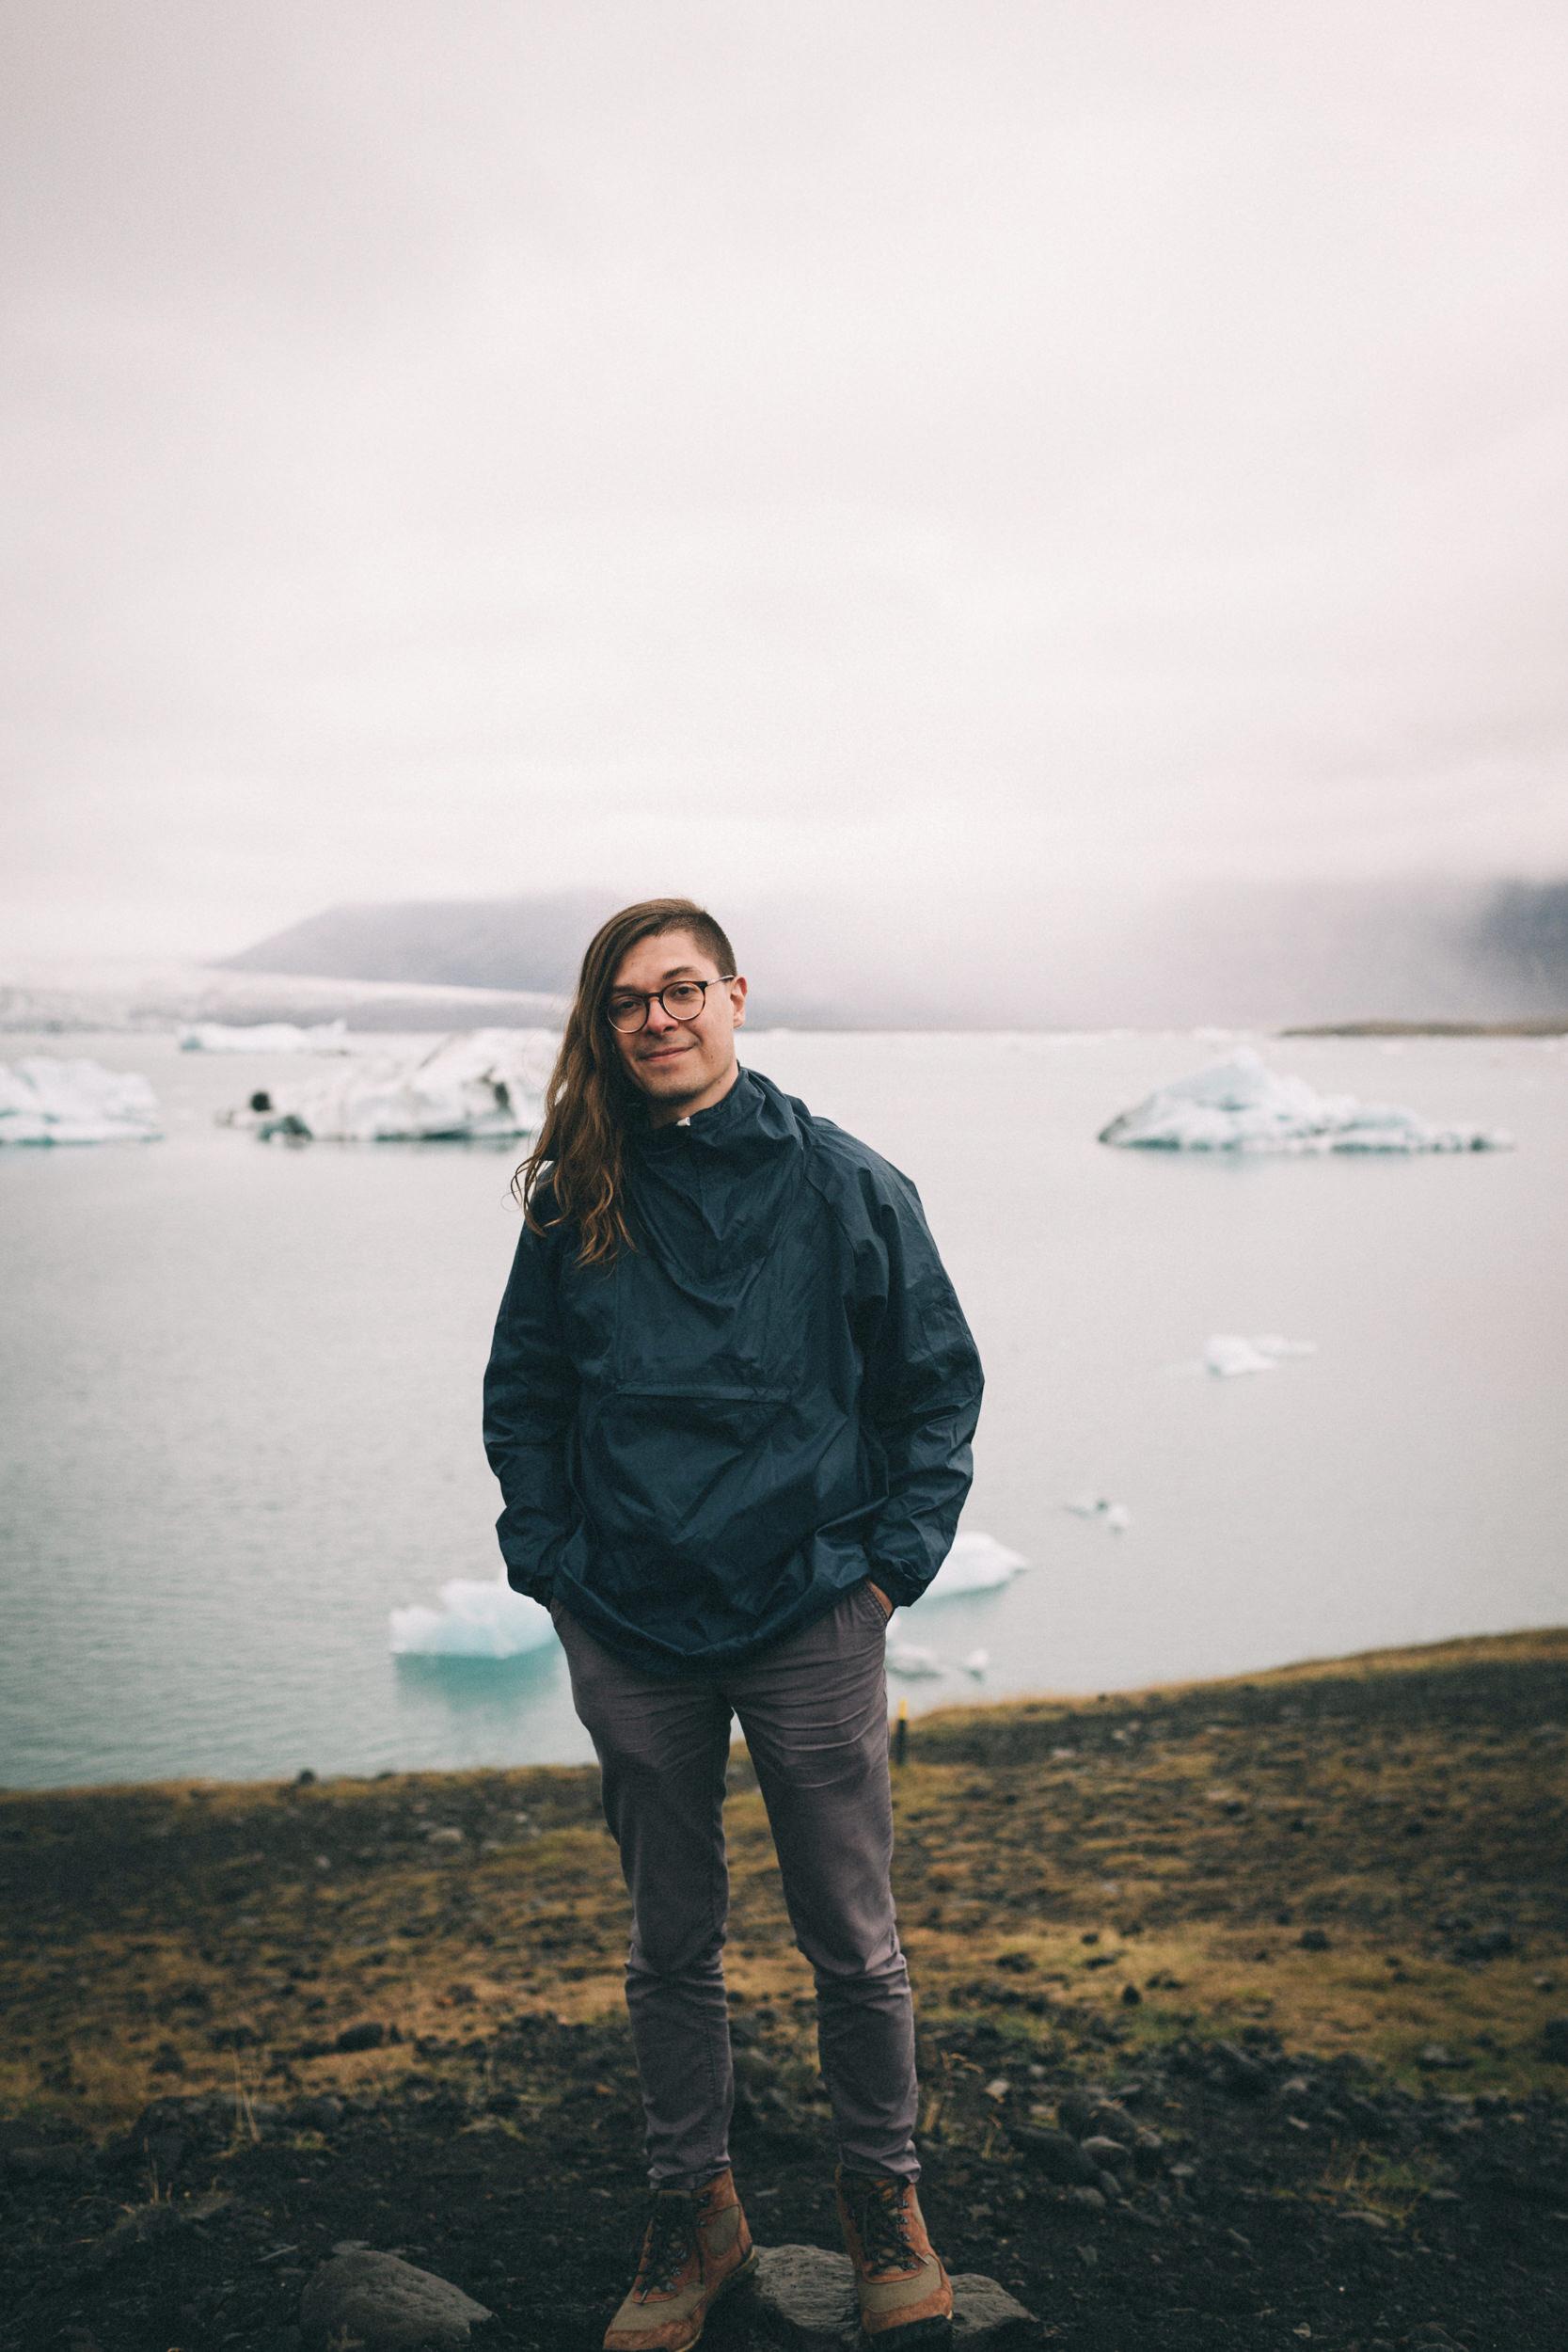 Sarah-Katherine-Davis-Photography-Iceland-Adventure-Elopement-Photographer-Louisville-Kentucky-Wedding-Photographer-Travel-Vik-Beach-Engagement-Session-Cozy-Iceland-South-Coast-228edit.jpg